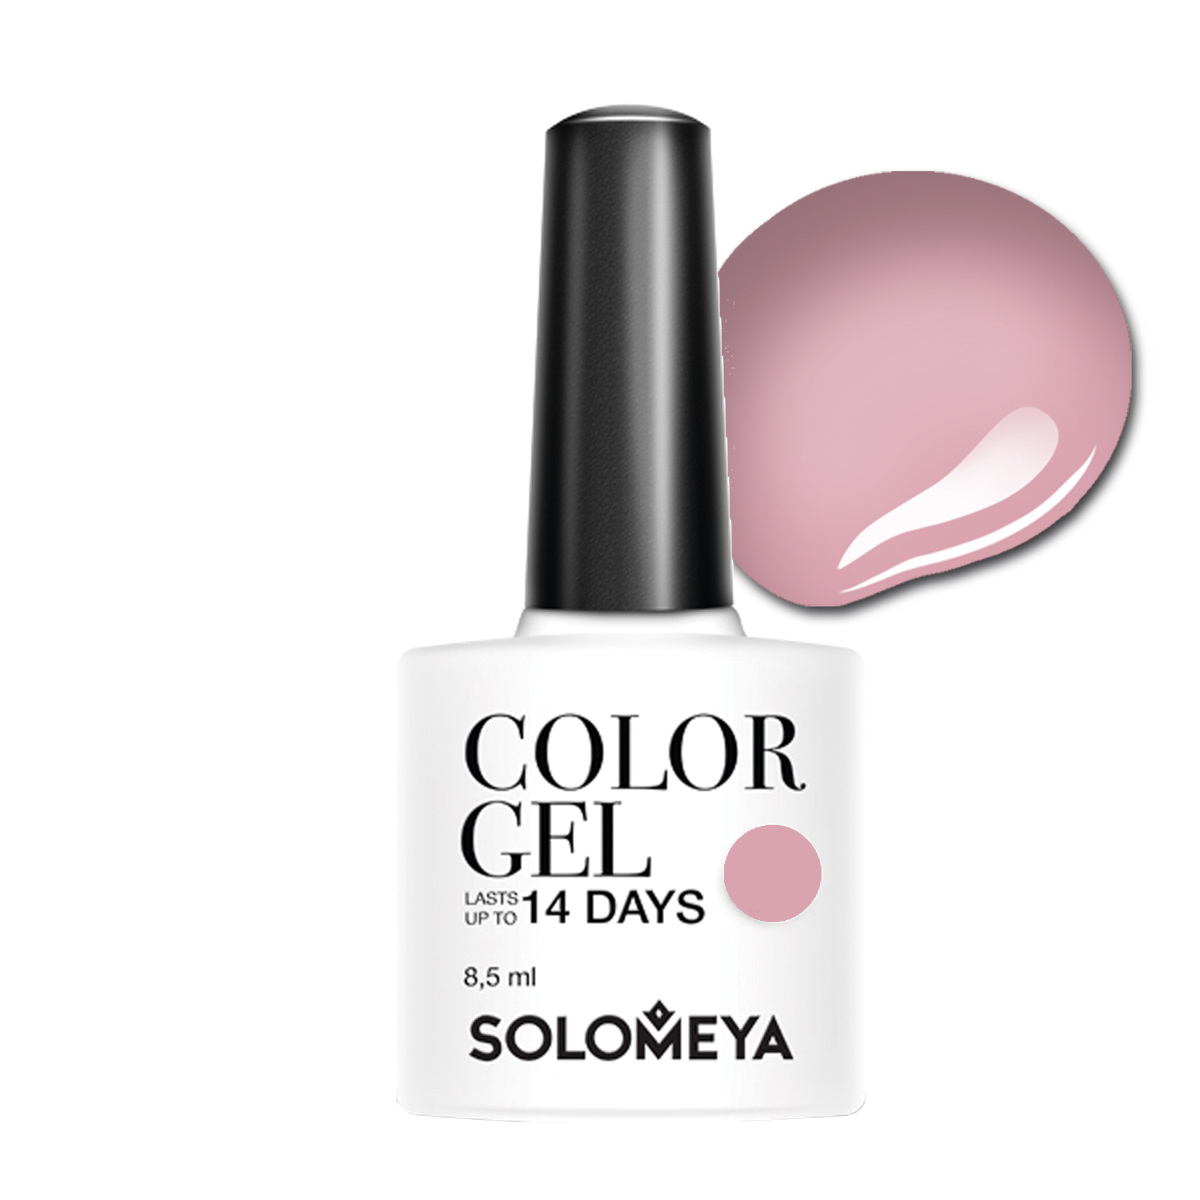 SOLOMEYA Гель-лак для ногтей SCG054 Весенняя сирень / Color Gel Spring Lilac 8,5 мл гель лак для ногтей solomeya floral garden color gel scg054 цвет ssg054 spring lilac variant hex name d6acb6